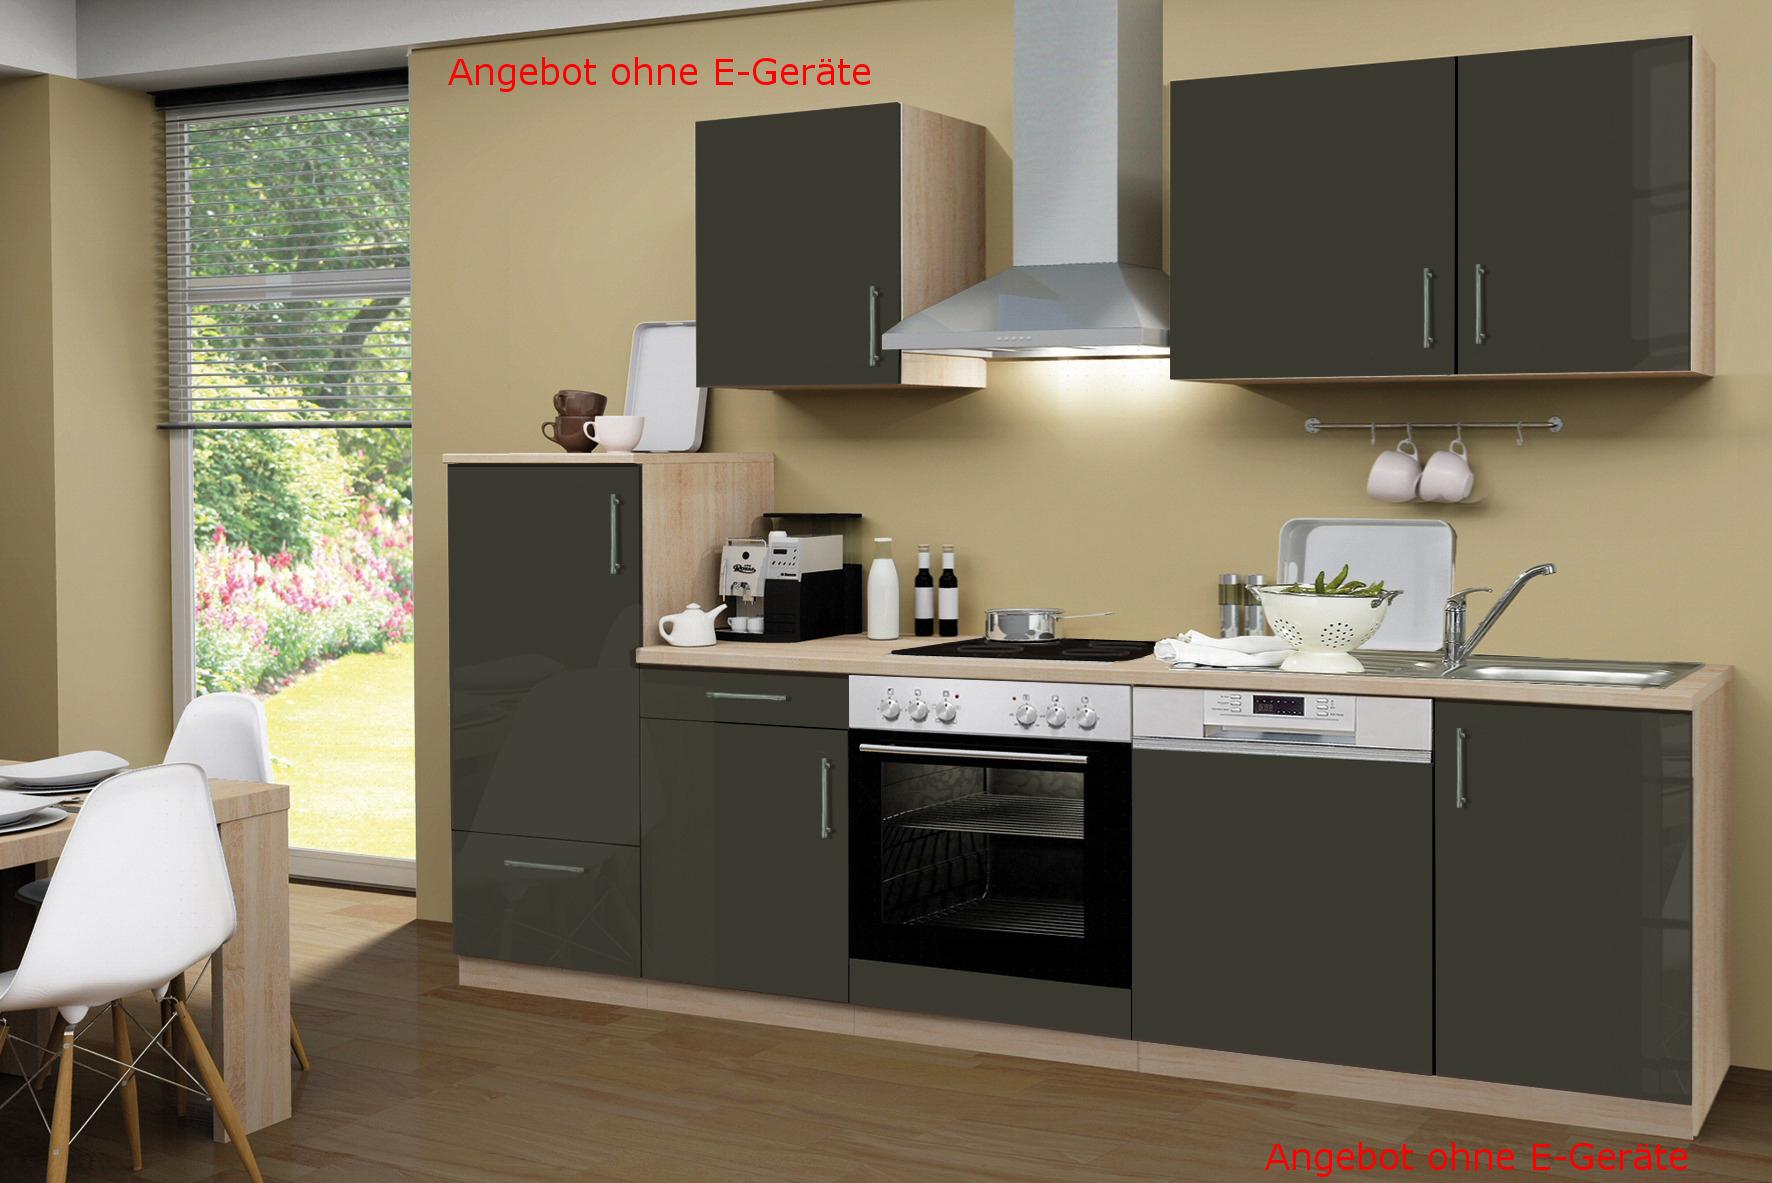 k chenblock ohne ger te einbauk che ohne elektroger te k che 280 hochglanz braun ebay. Black Bedroom Furniture Sets. Home Design Ideas